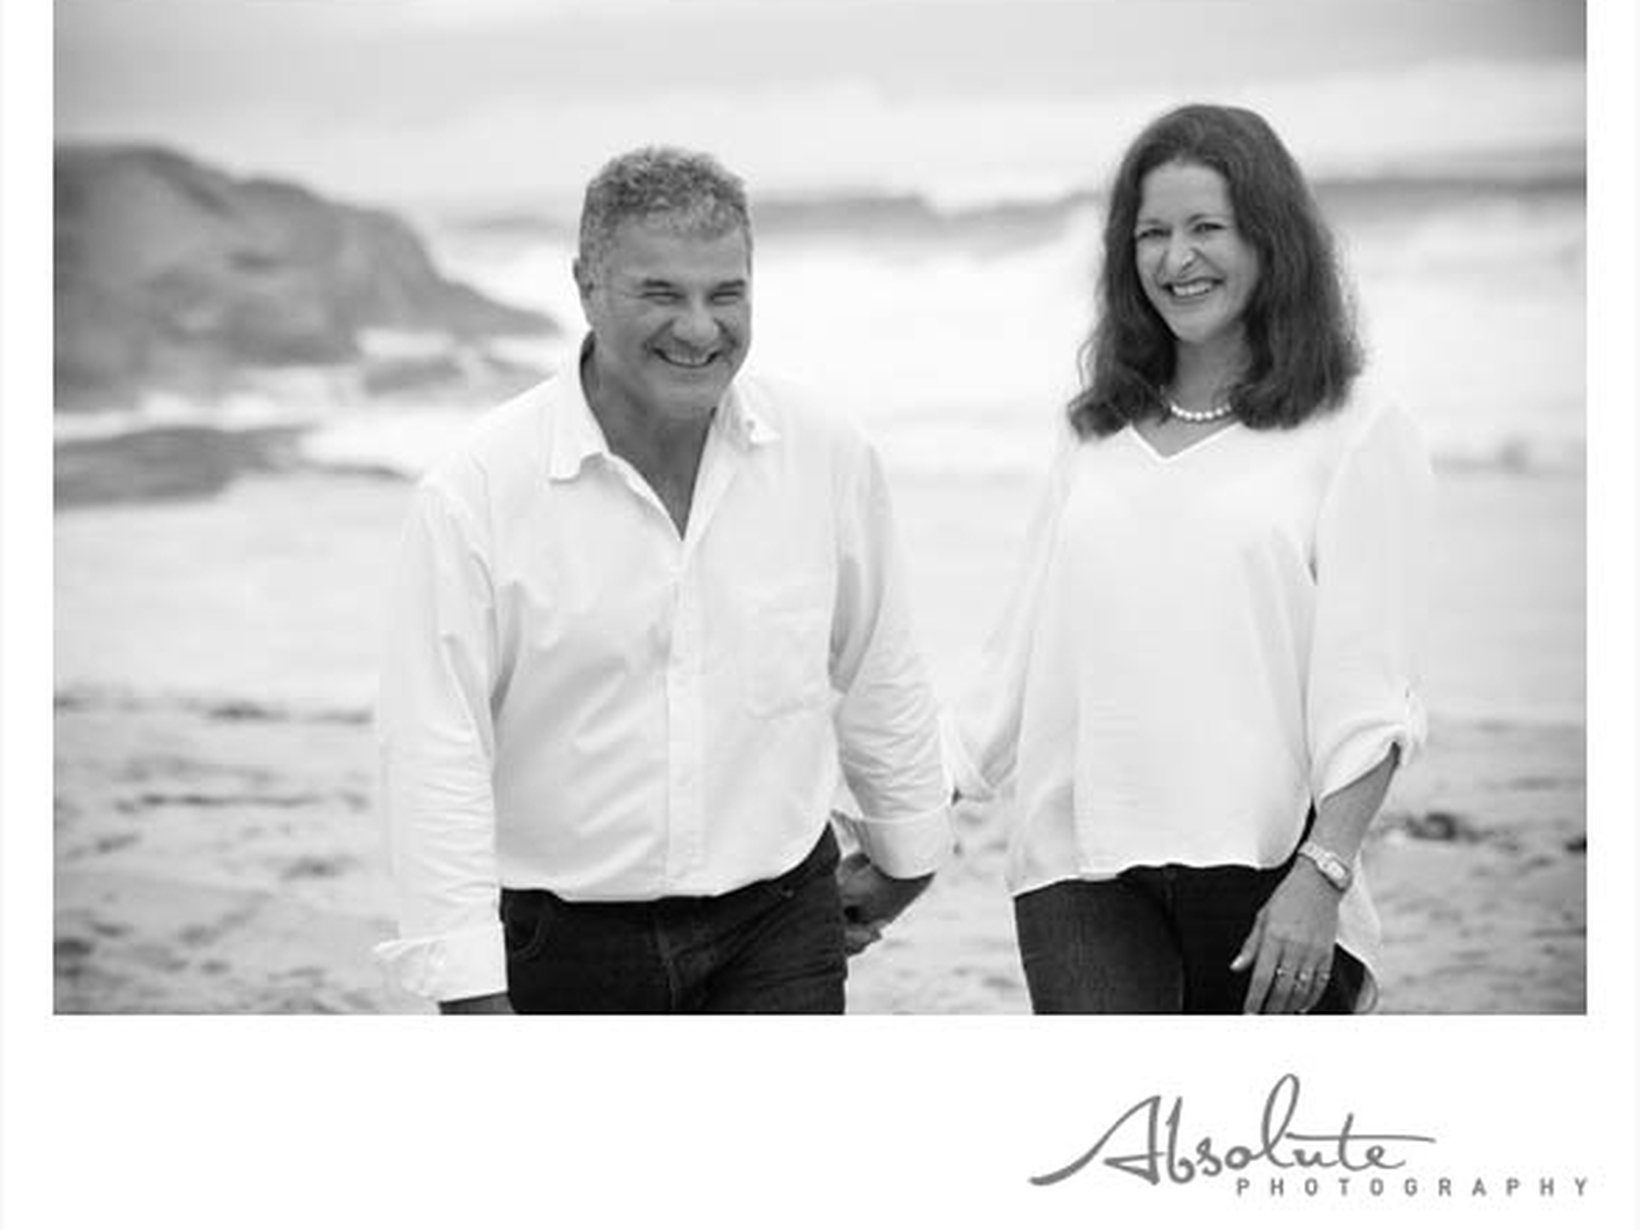 Alison & Nicholas from Sydney, New South Wales, Australia